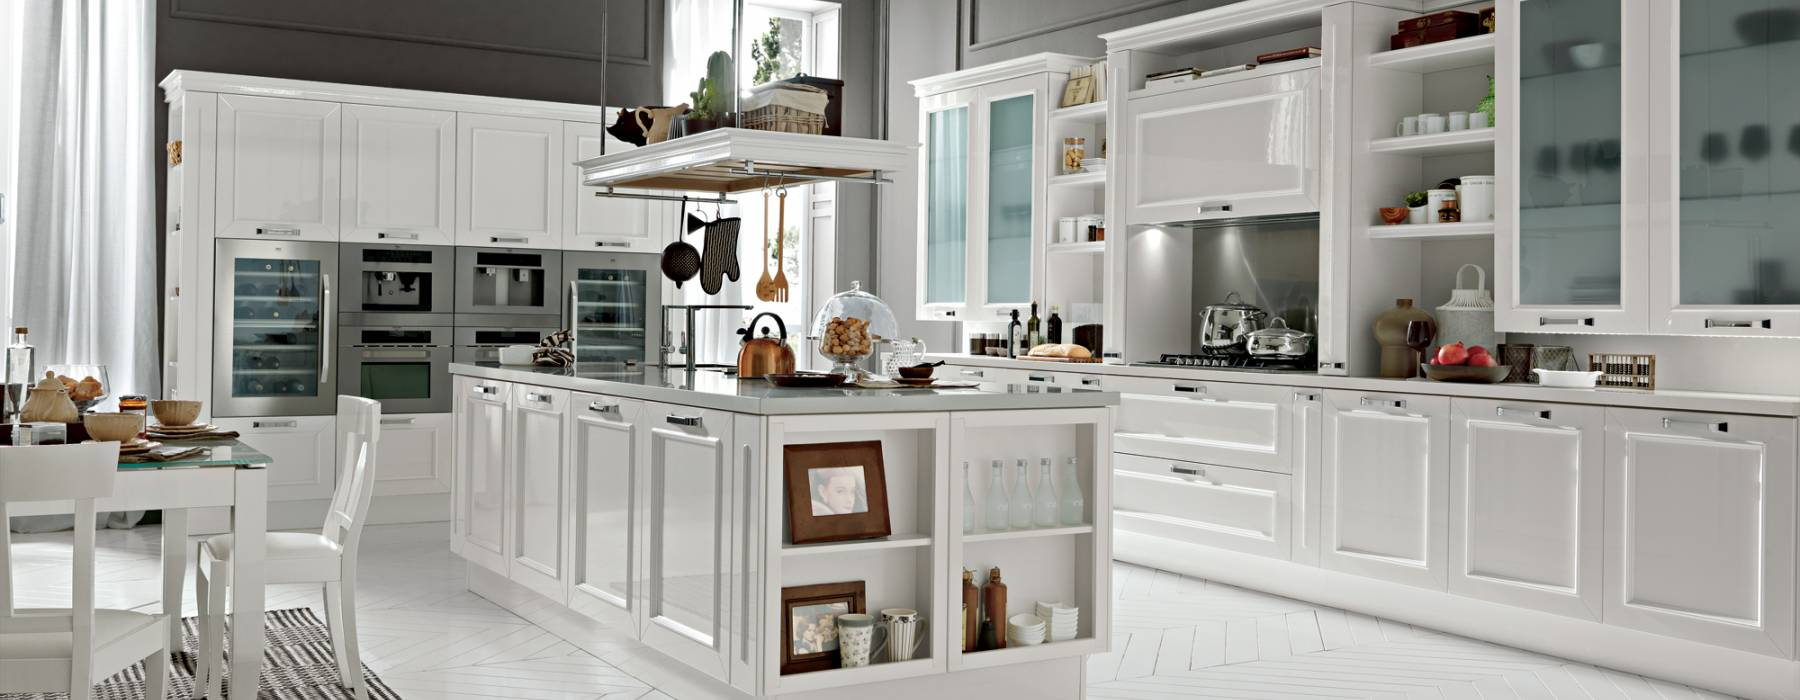 Le cucine in stile provenzale e industrial chic febal 2015 - Cucine in muratura stile provenzale ...